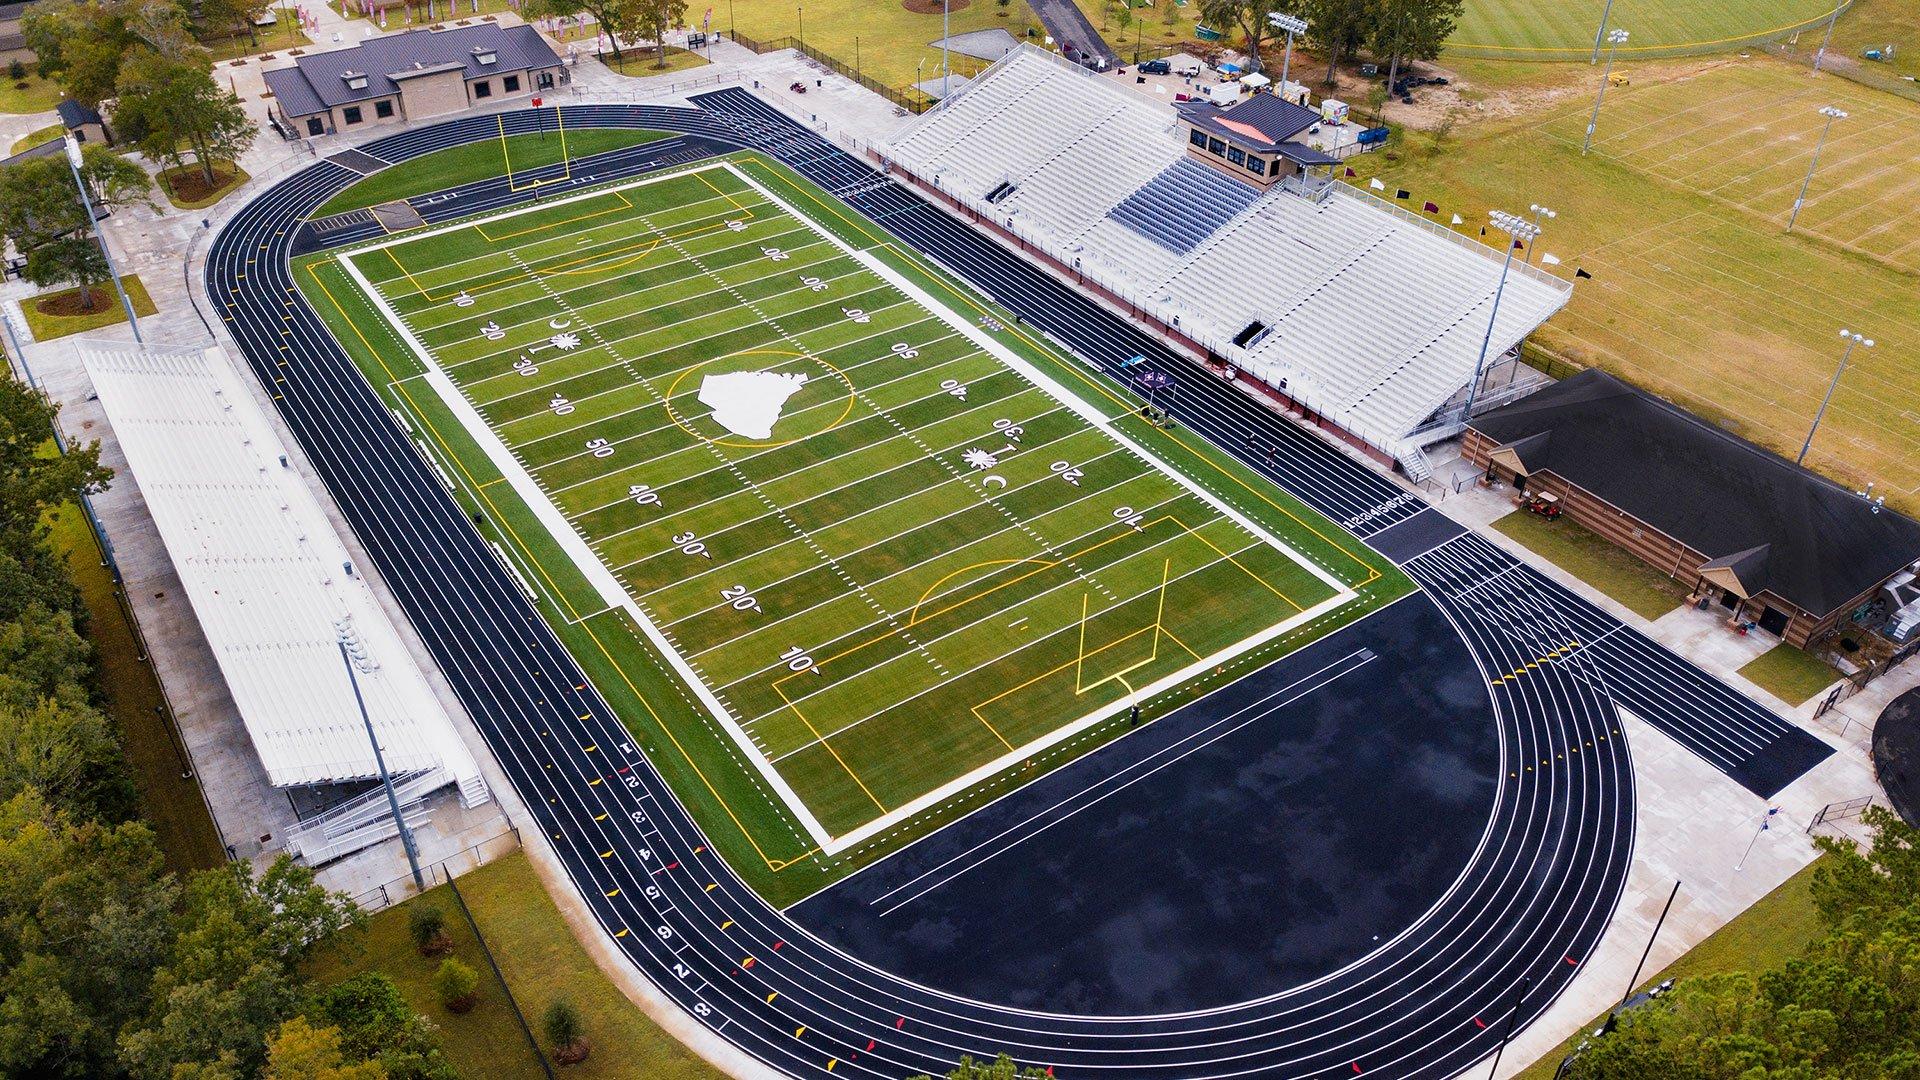 Charleston County School District 2, Stadium & Athletic Facility